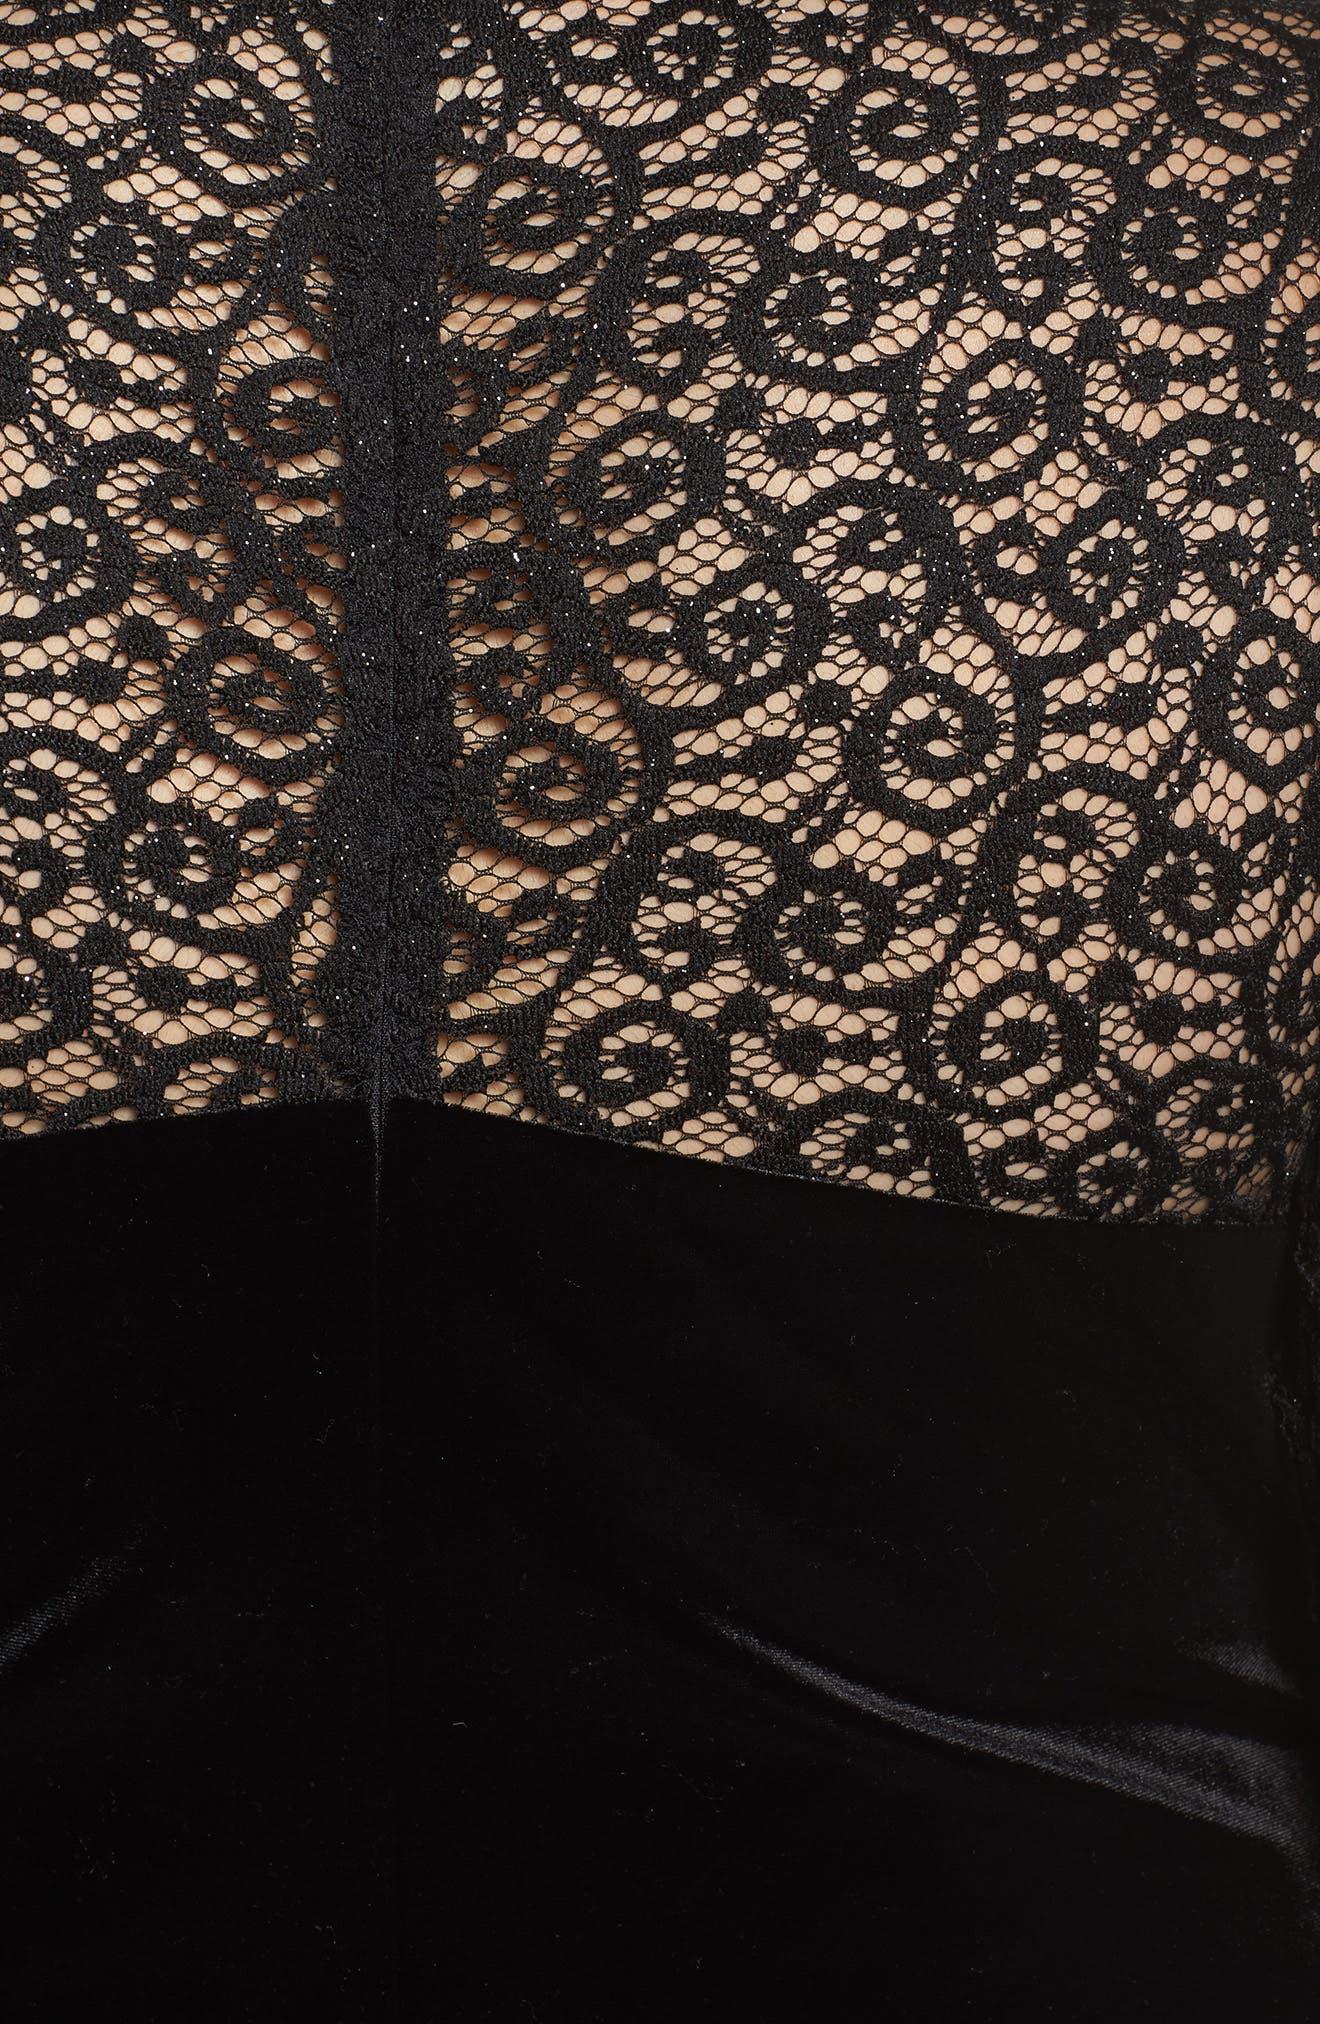 Velvet & Glitter Lace Sheath Dress,                             Alternate thumbnail 5, color,                             Black